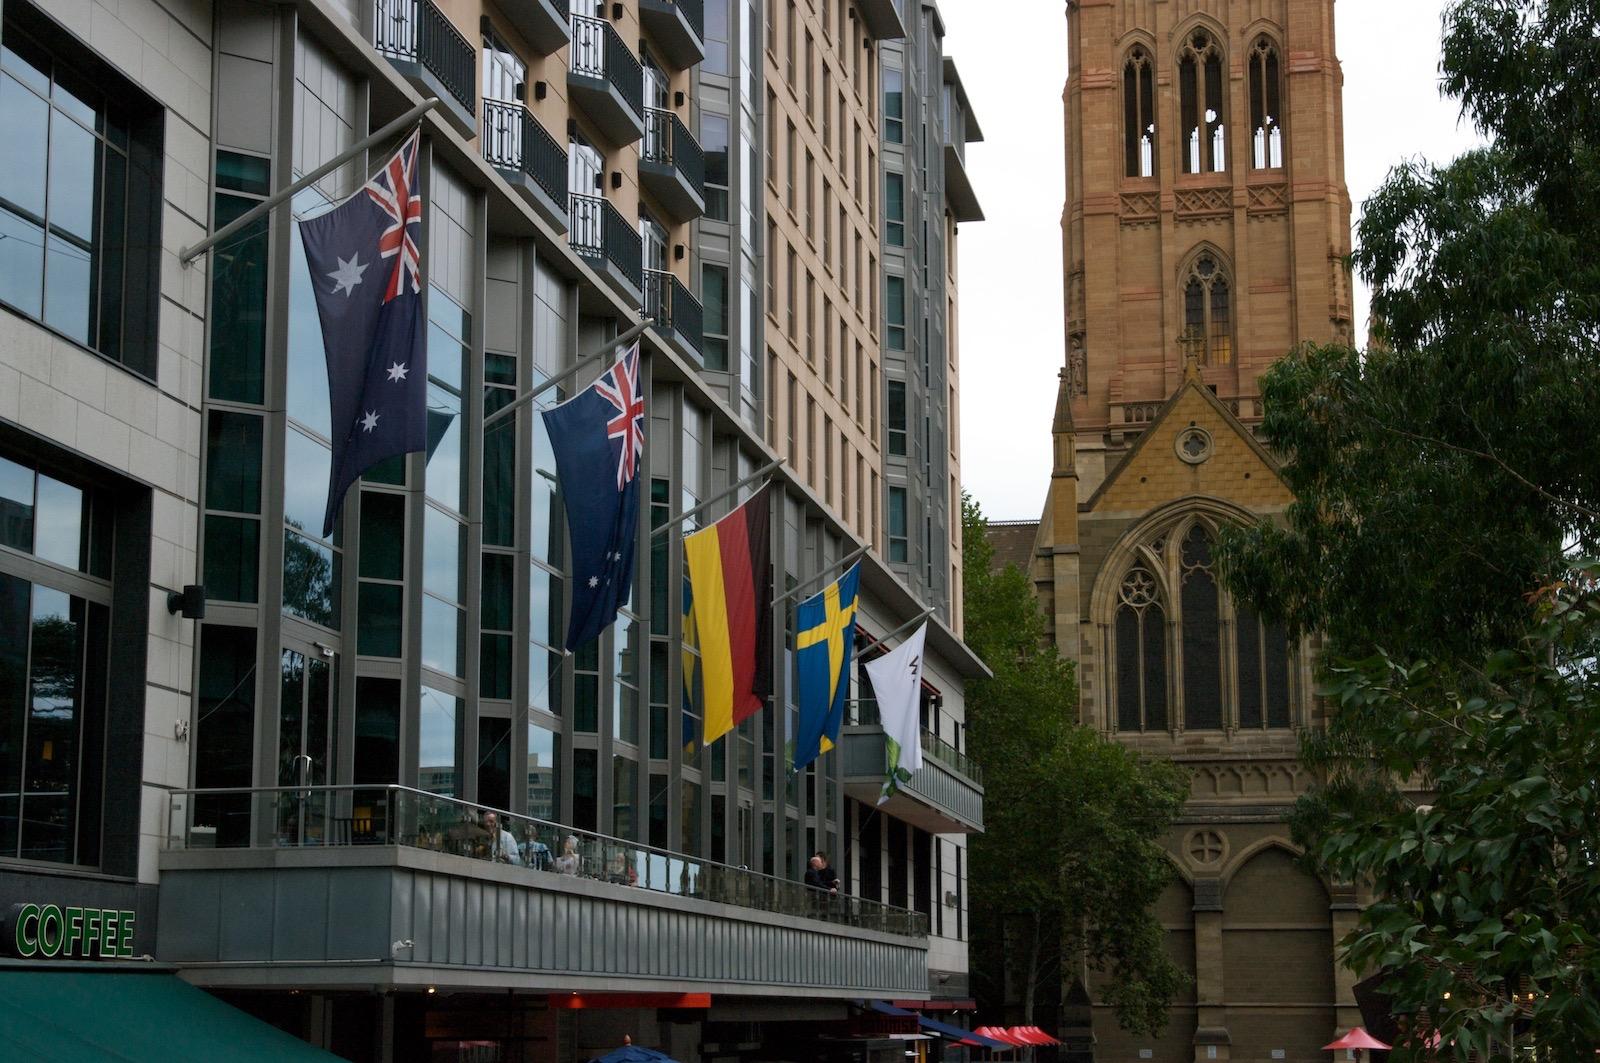 Melbourne stuff - 1 of 223 (145).jpg